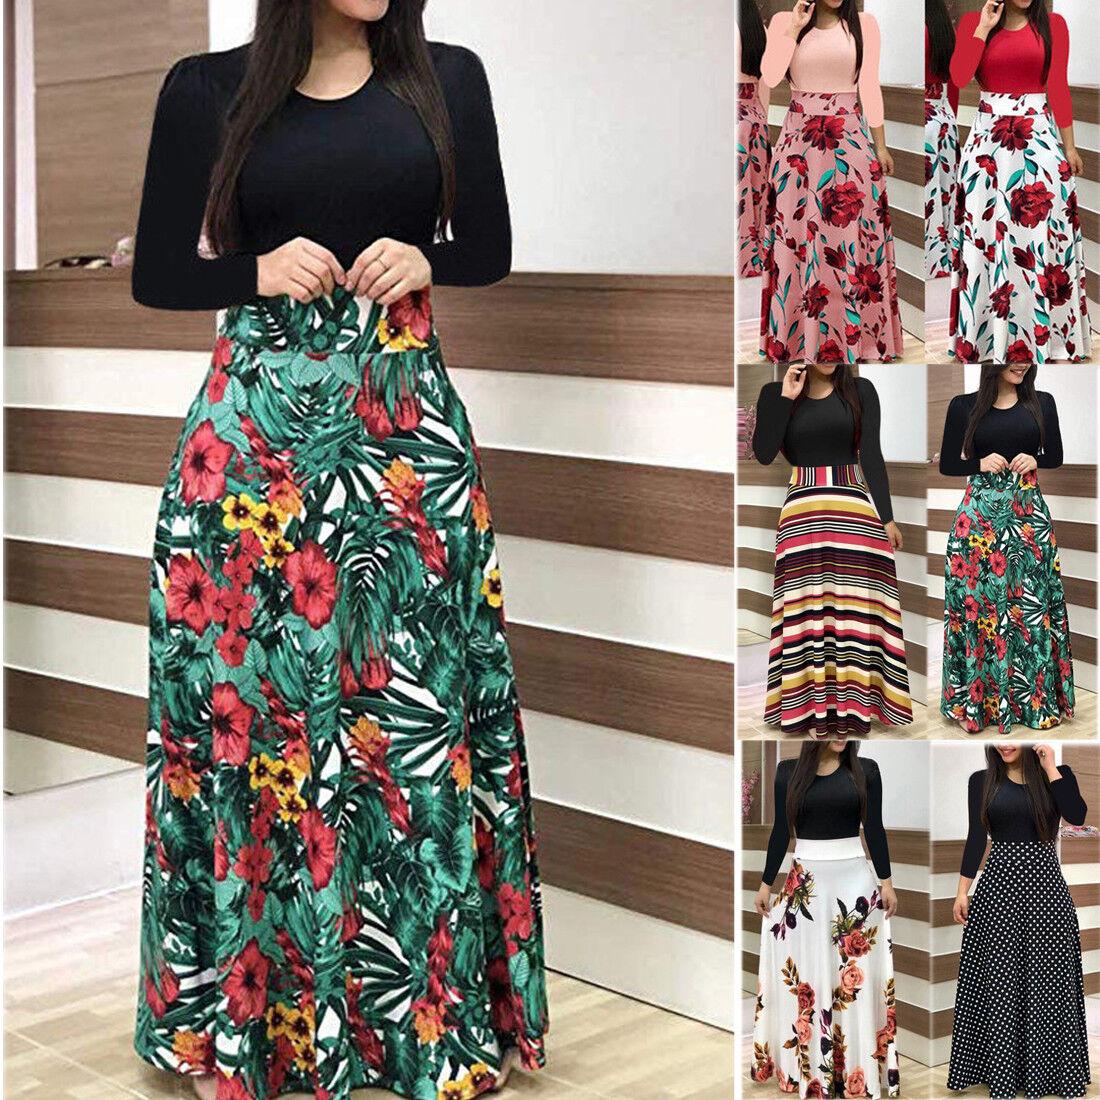 Plus Size Ladies Long Sleeve Floral Boho Women Party Bodycon